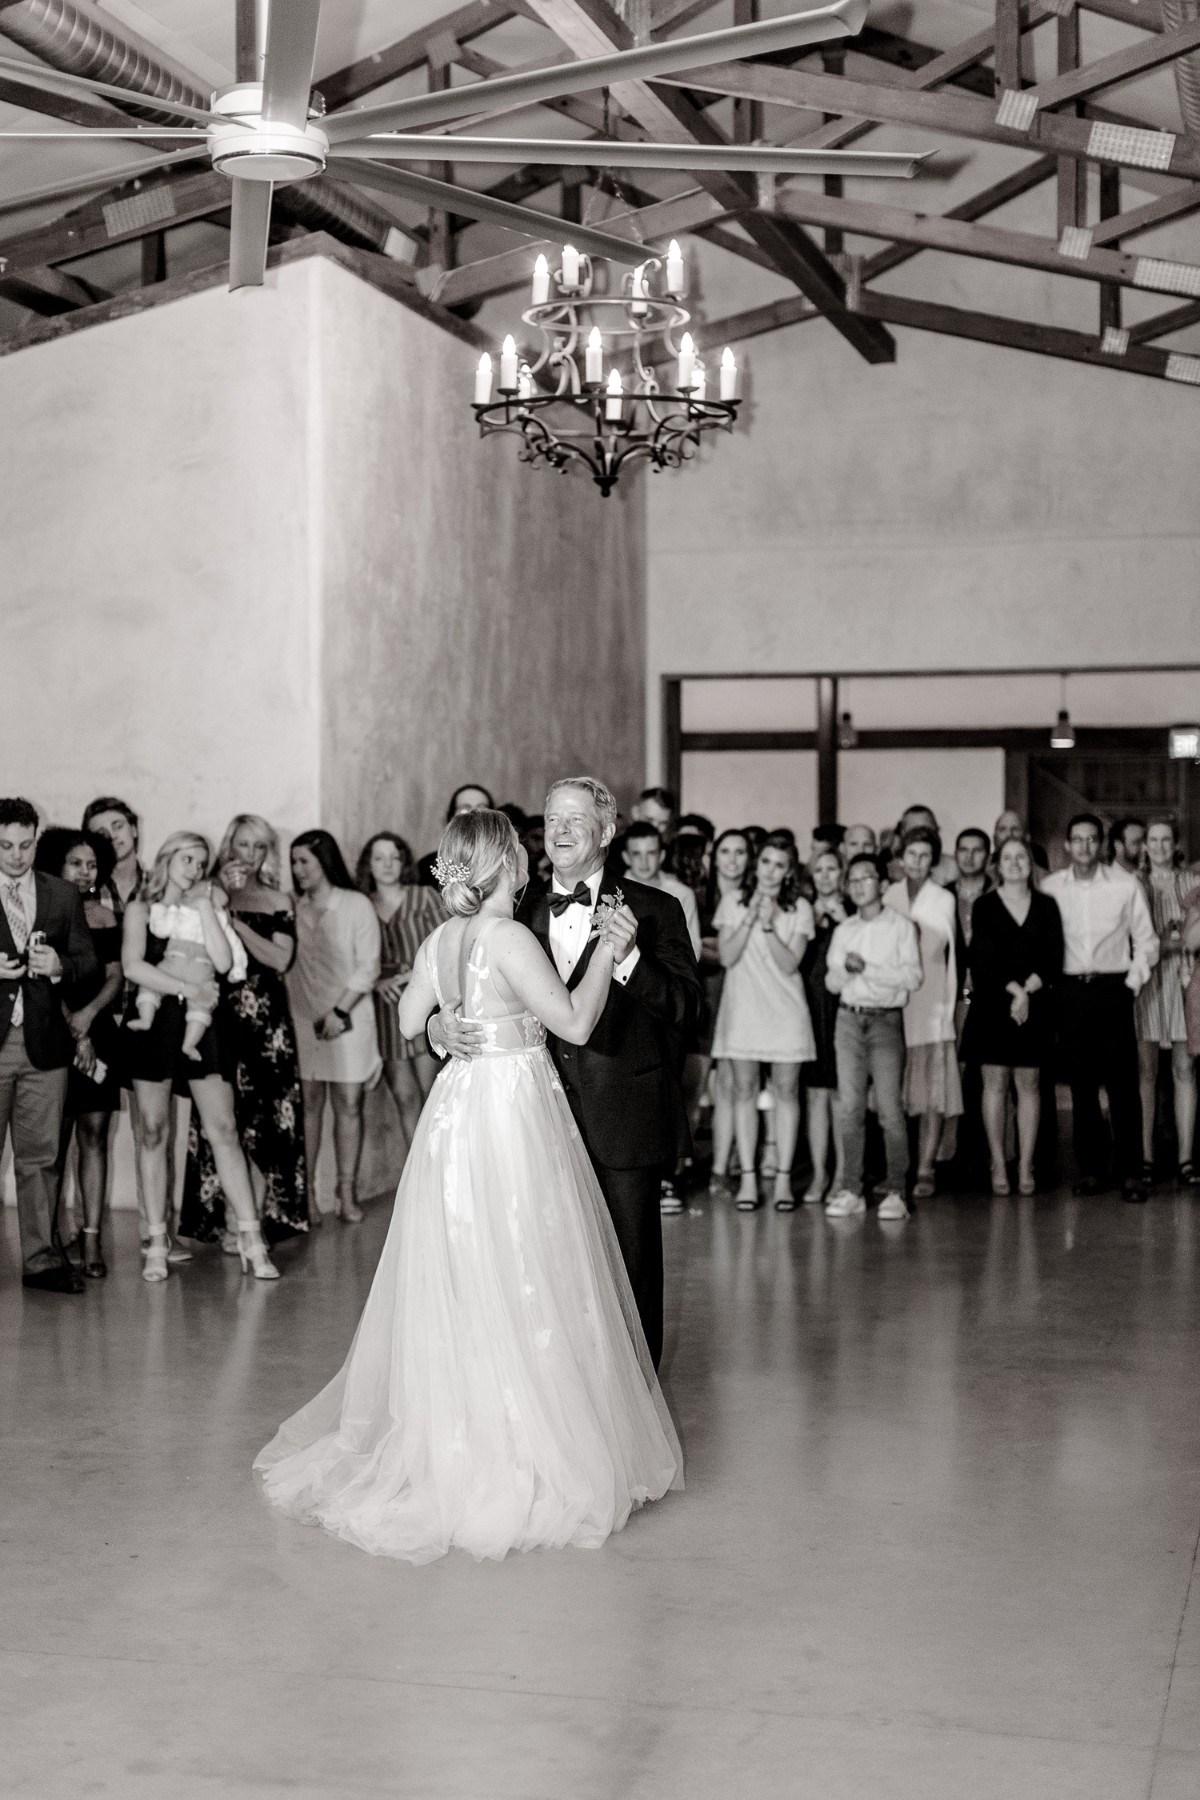 ennis-texas-wedding-photographer-kaitlyn-bullard-118.jpg